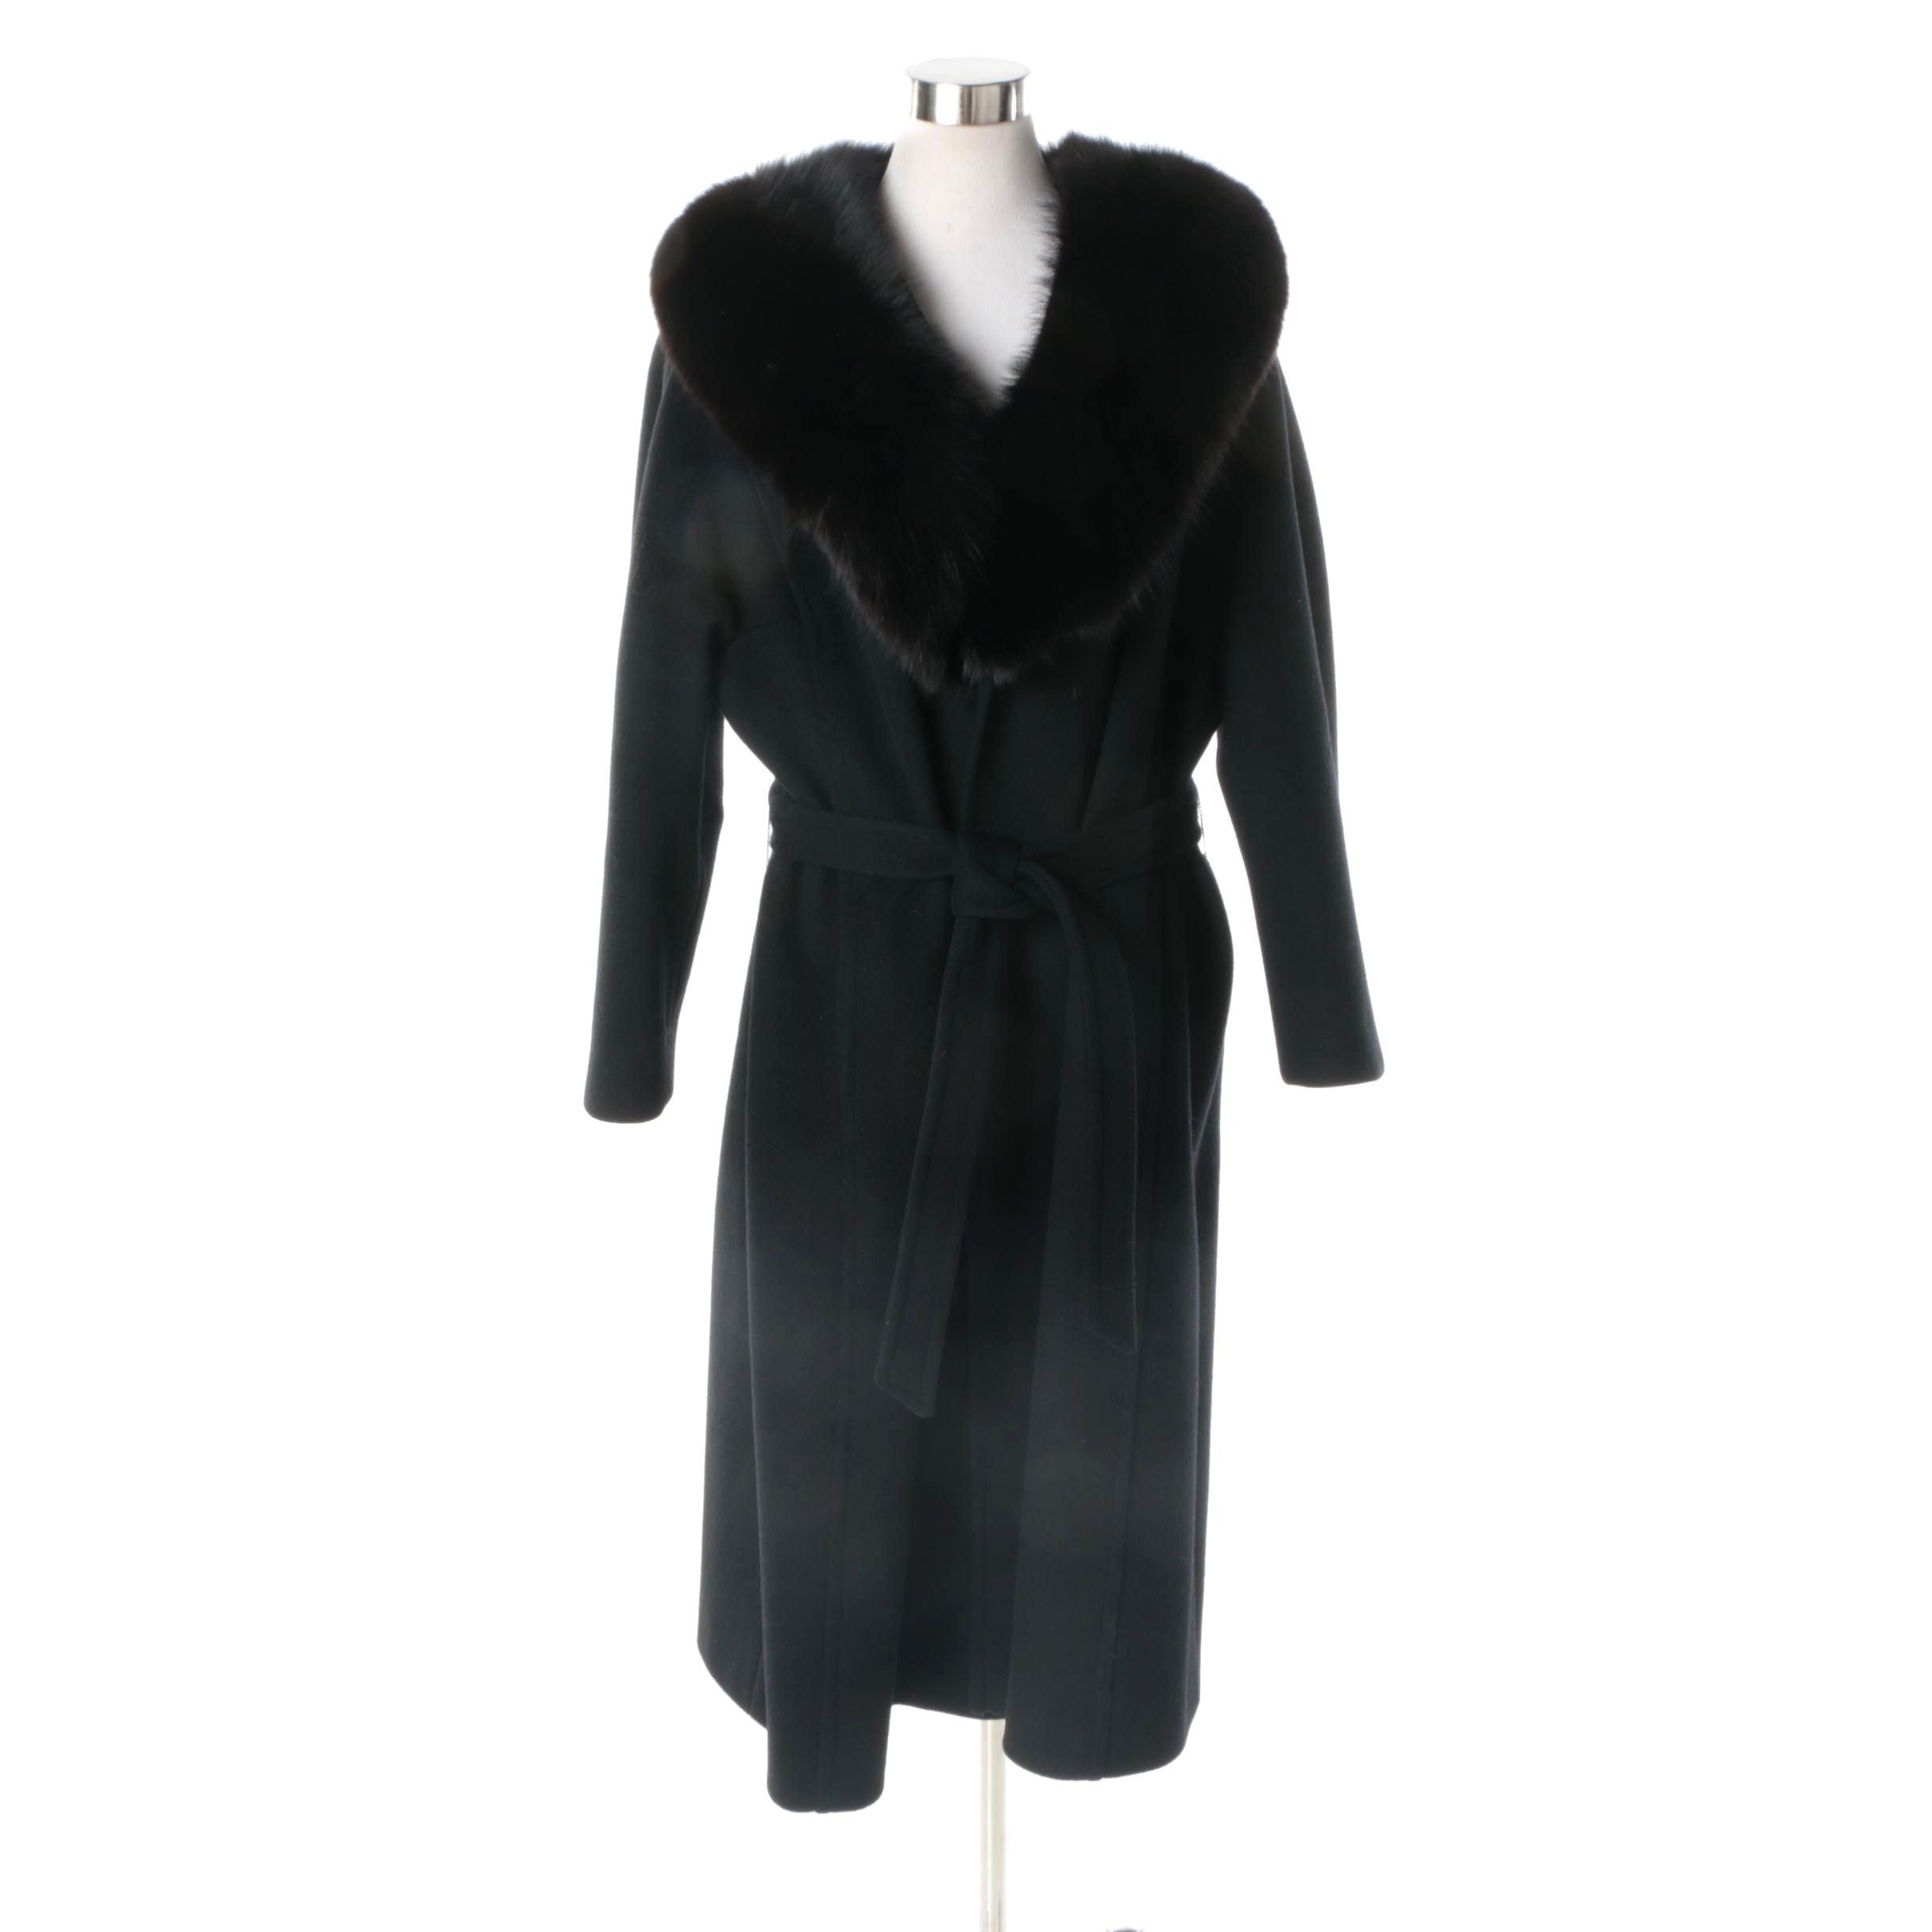 Women's Vintage Windermere Black Wool Coat with Fox Fur Collar